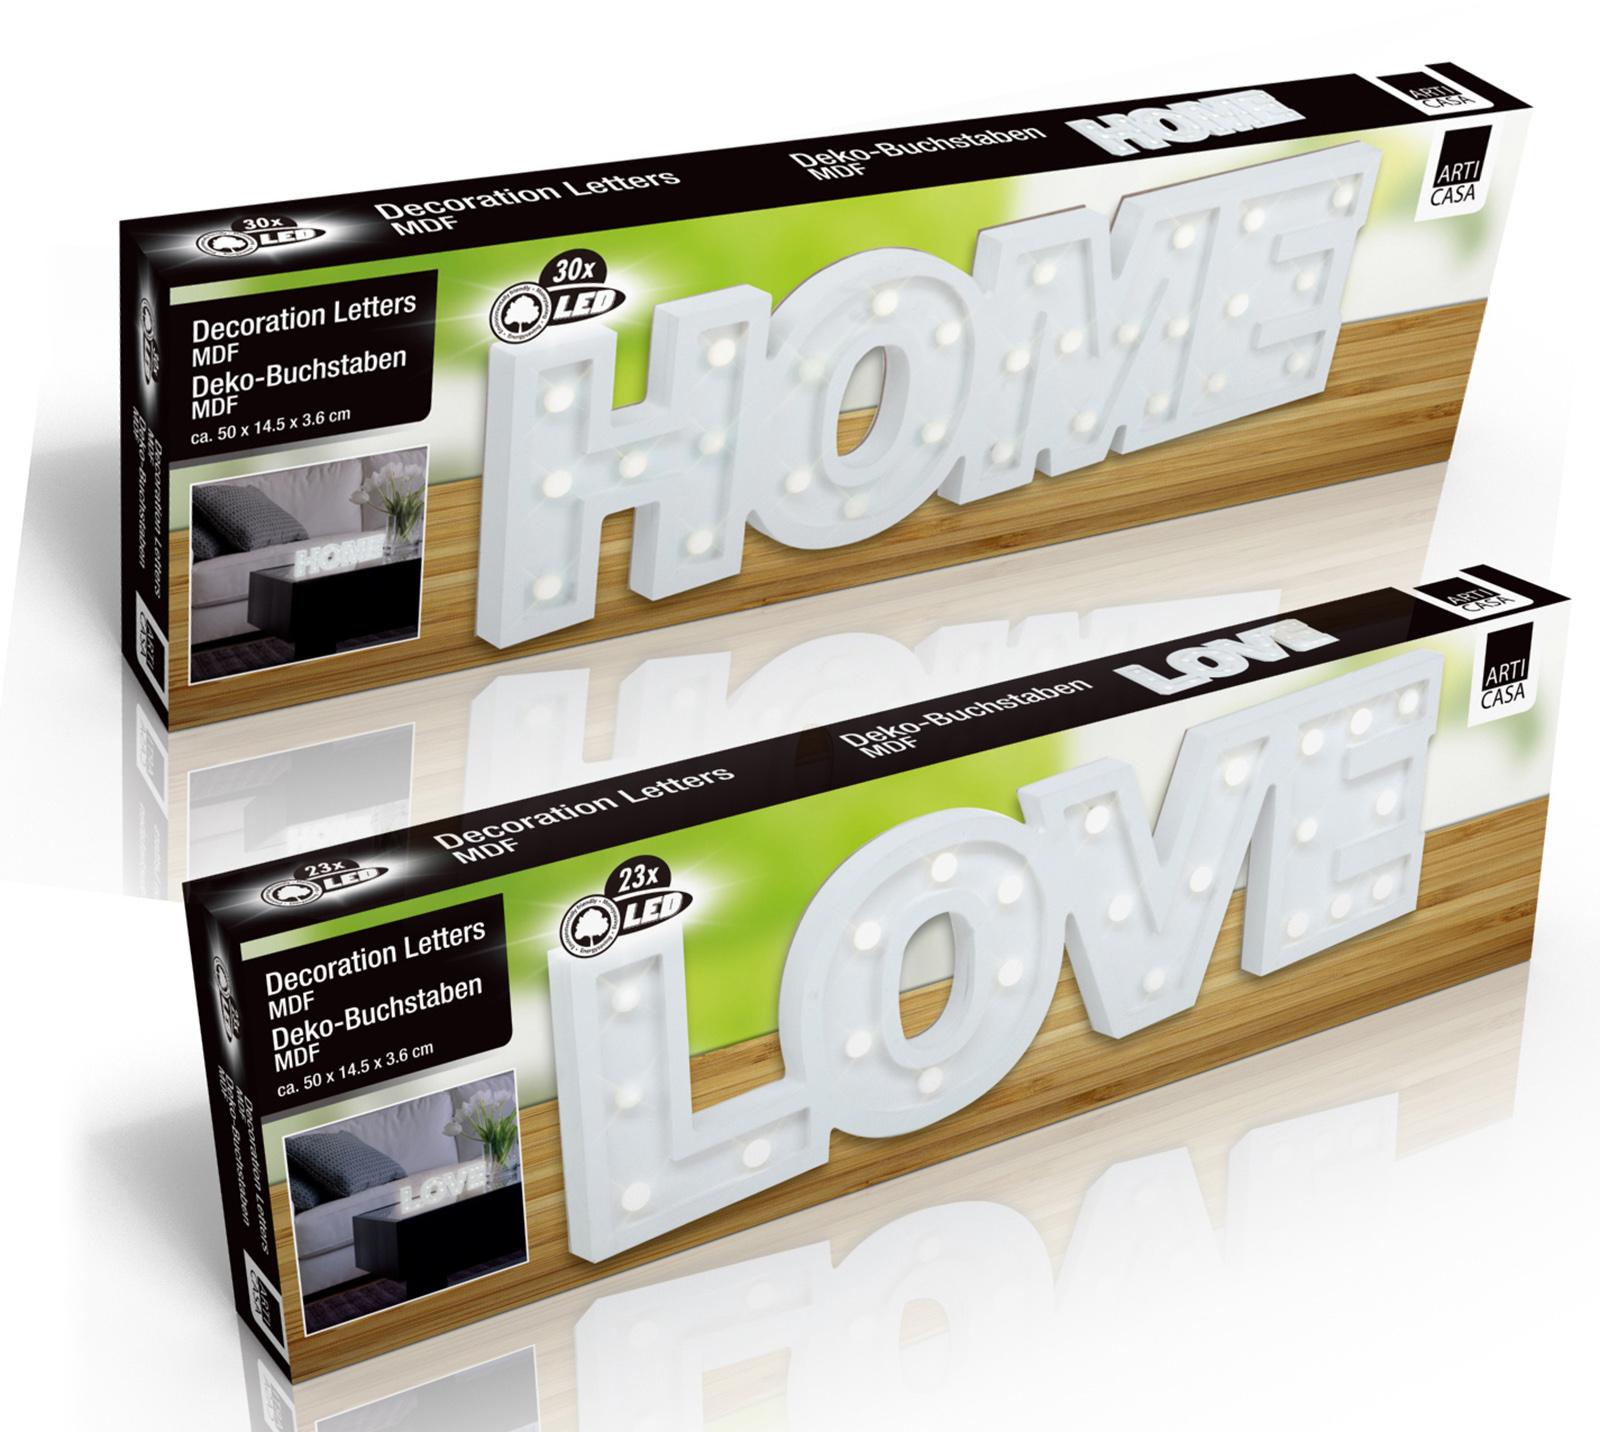 led dekobuchstaben home love 3d deko schriftzug buchstaben. Black Bedroom Furniture Sets. Home Design Ideas